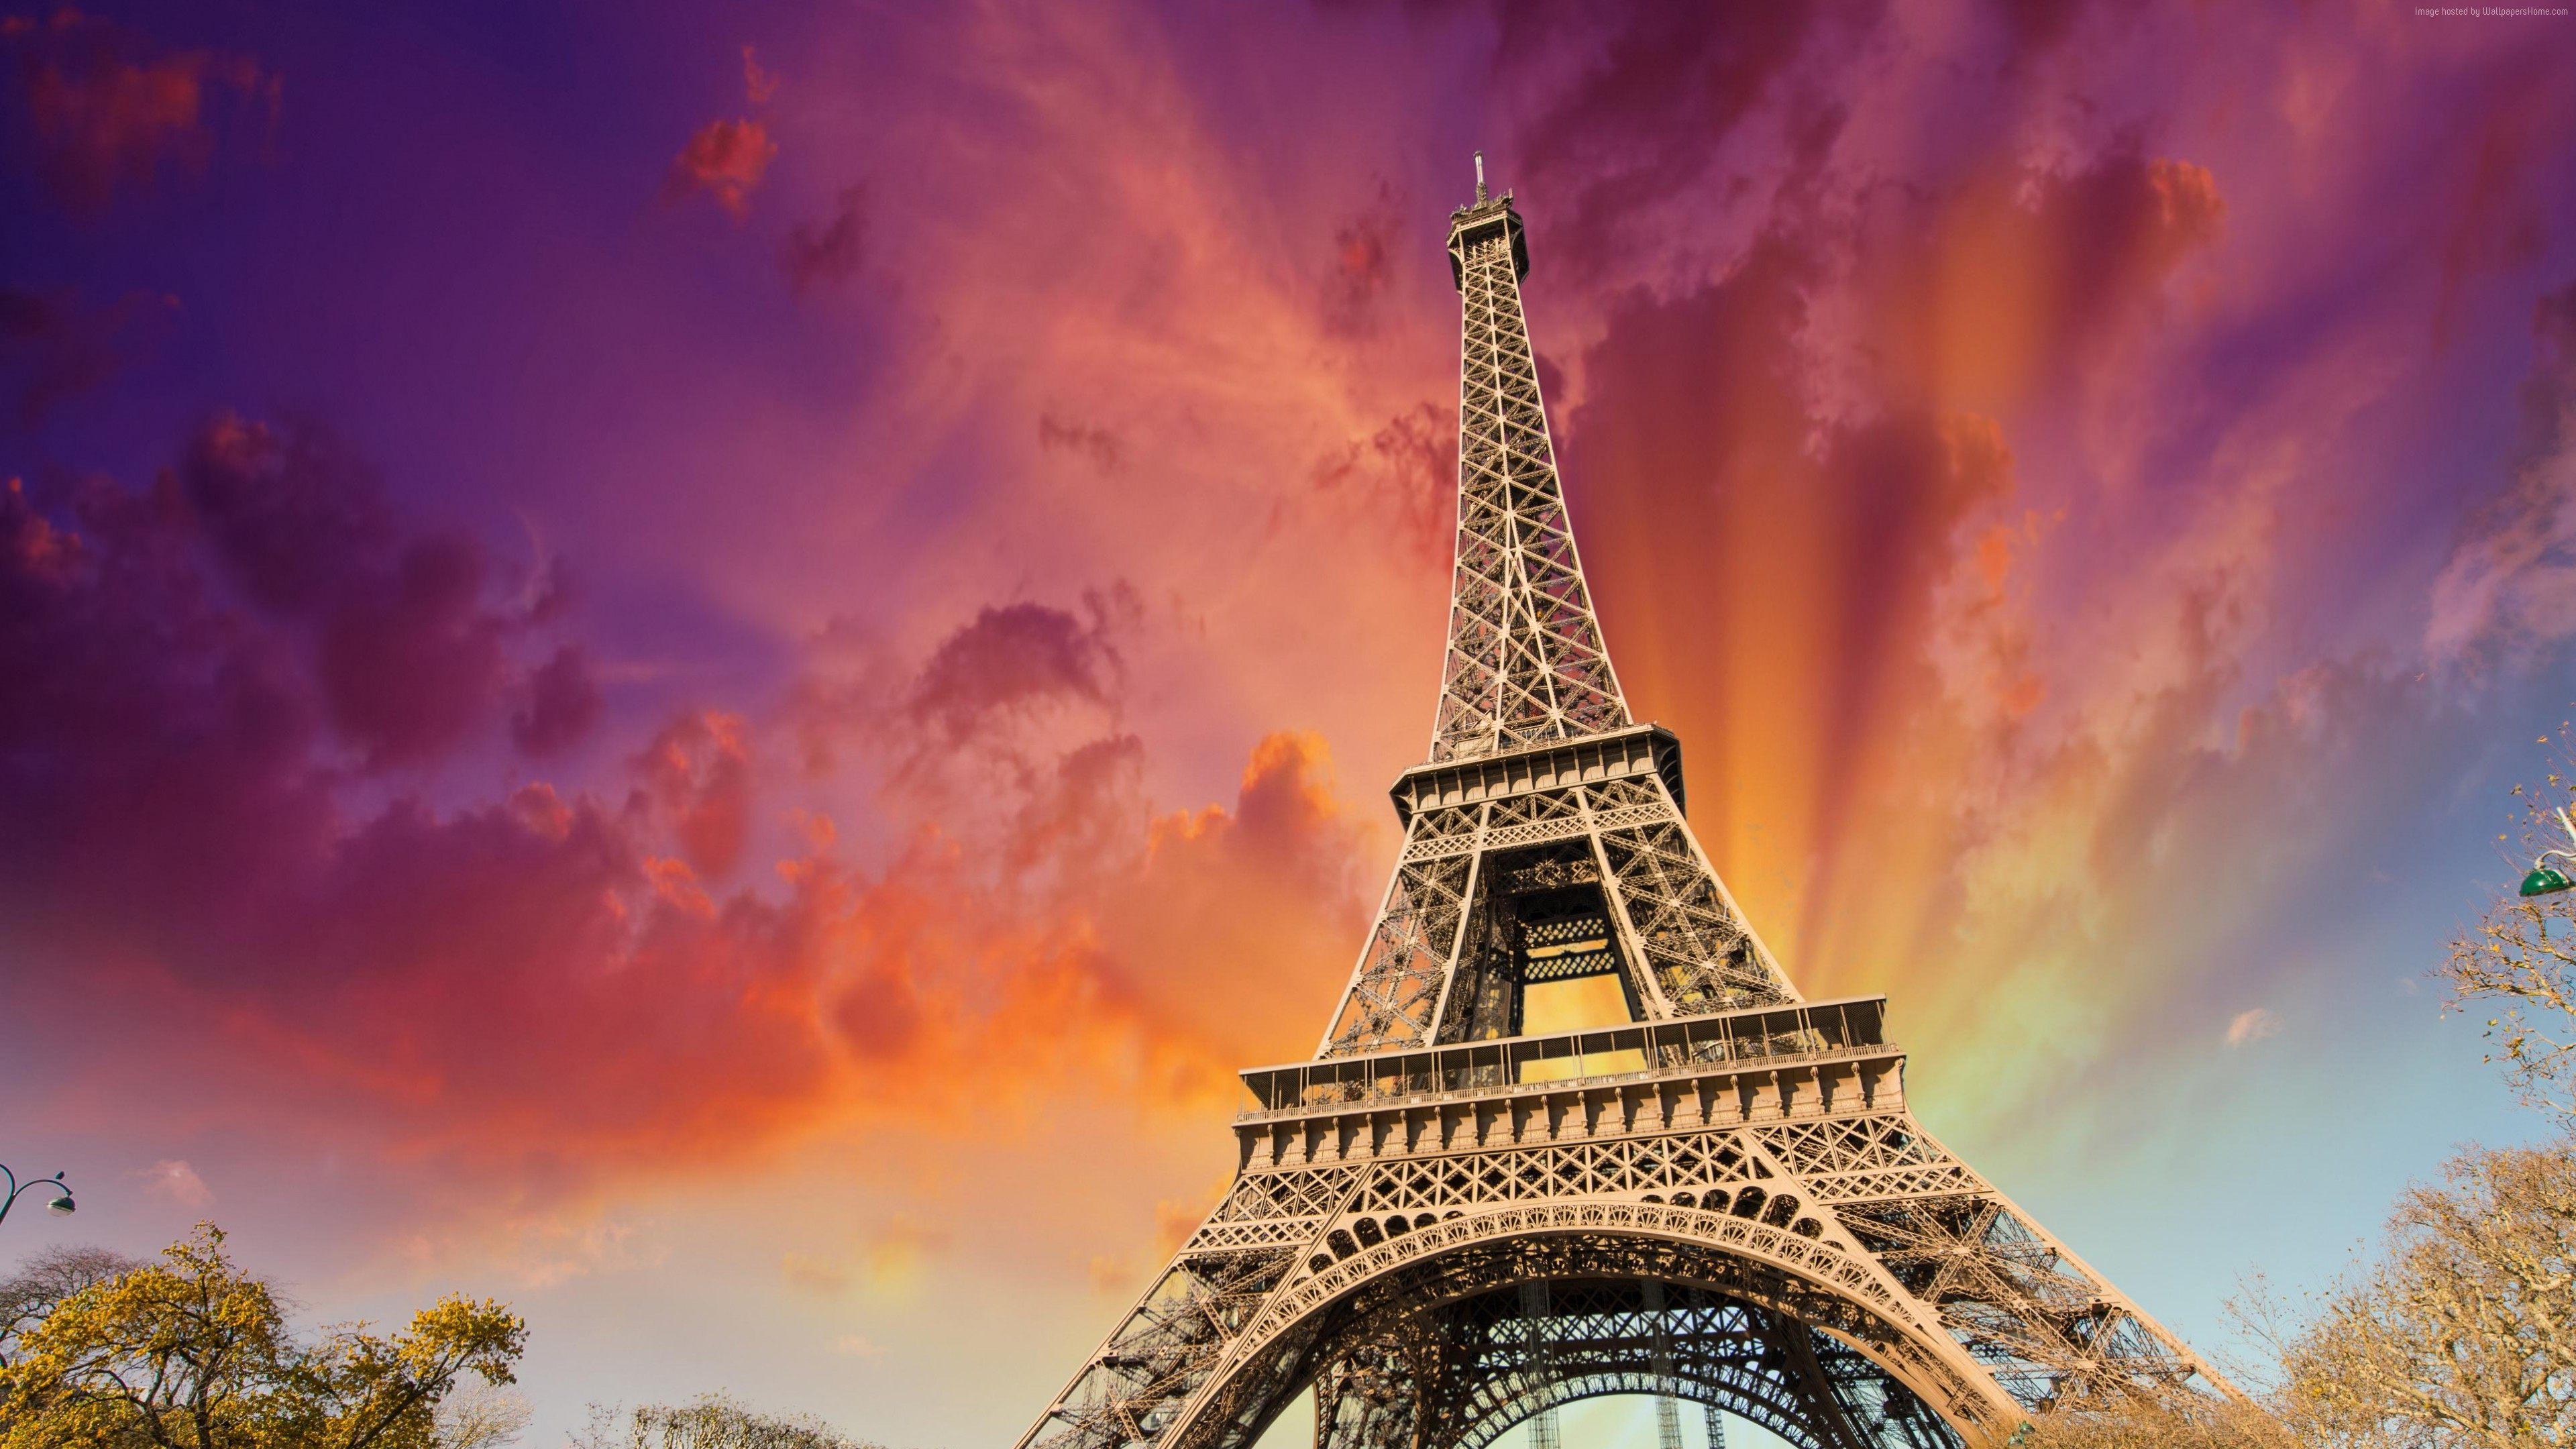 Hd Wallpapers Backgrounds: Eiffel Tower Wallpaper HD